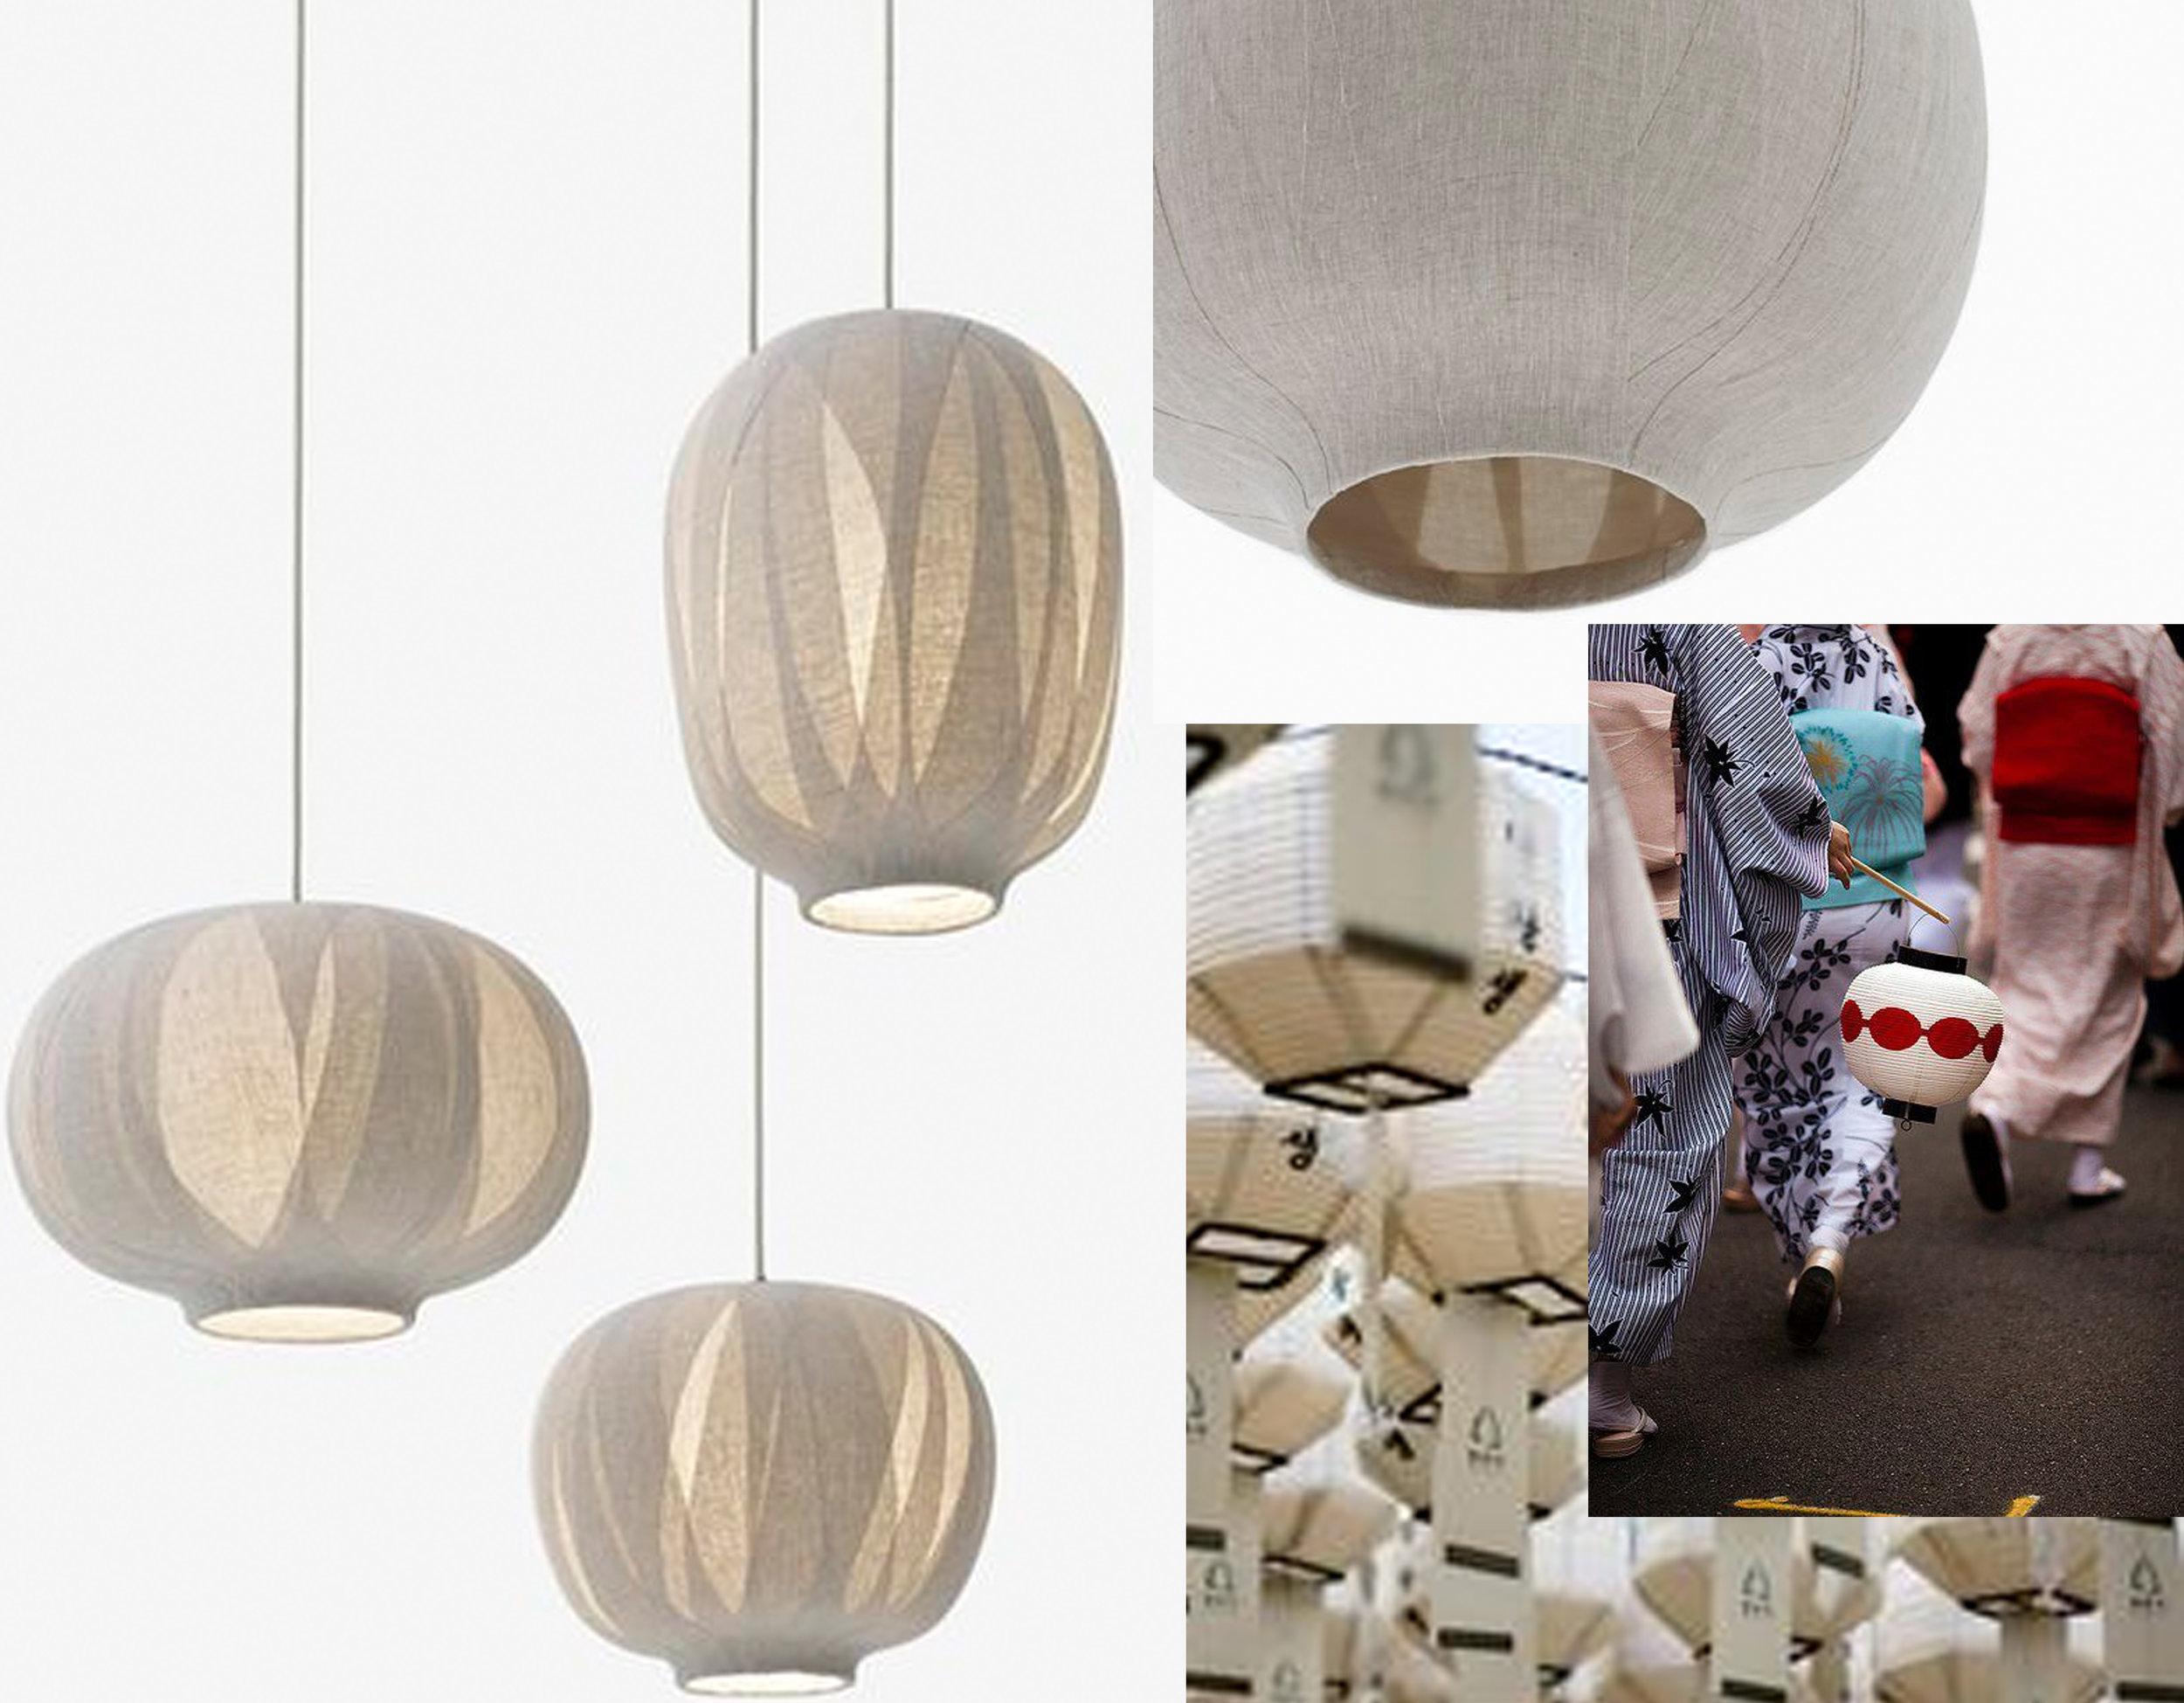 Nuno lamp  Nendo  - kimono image and paper lamp via  Pinterest